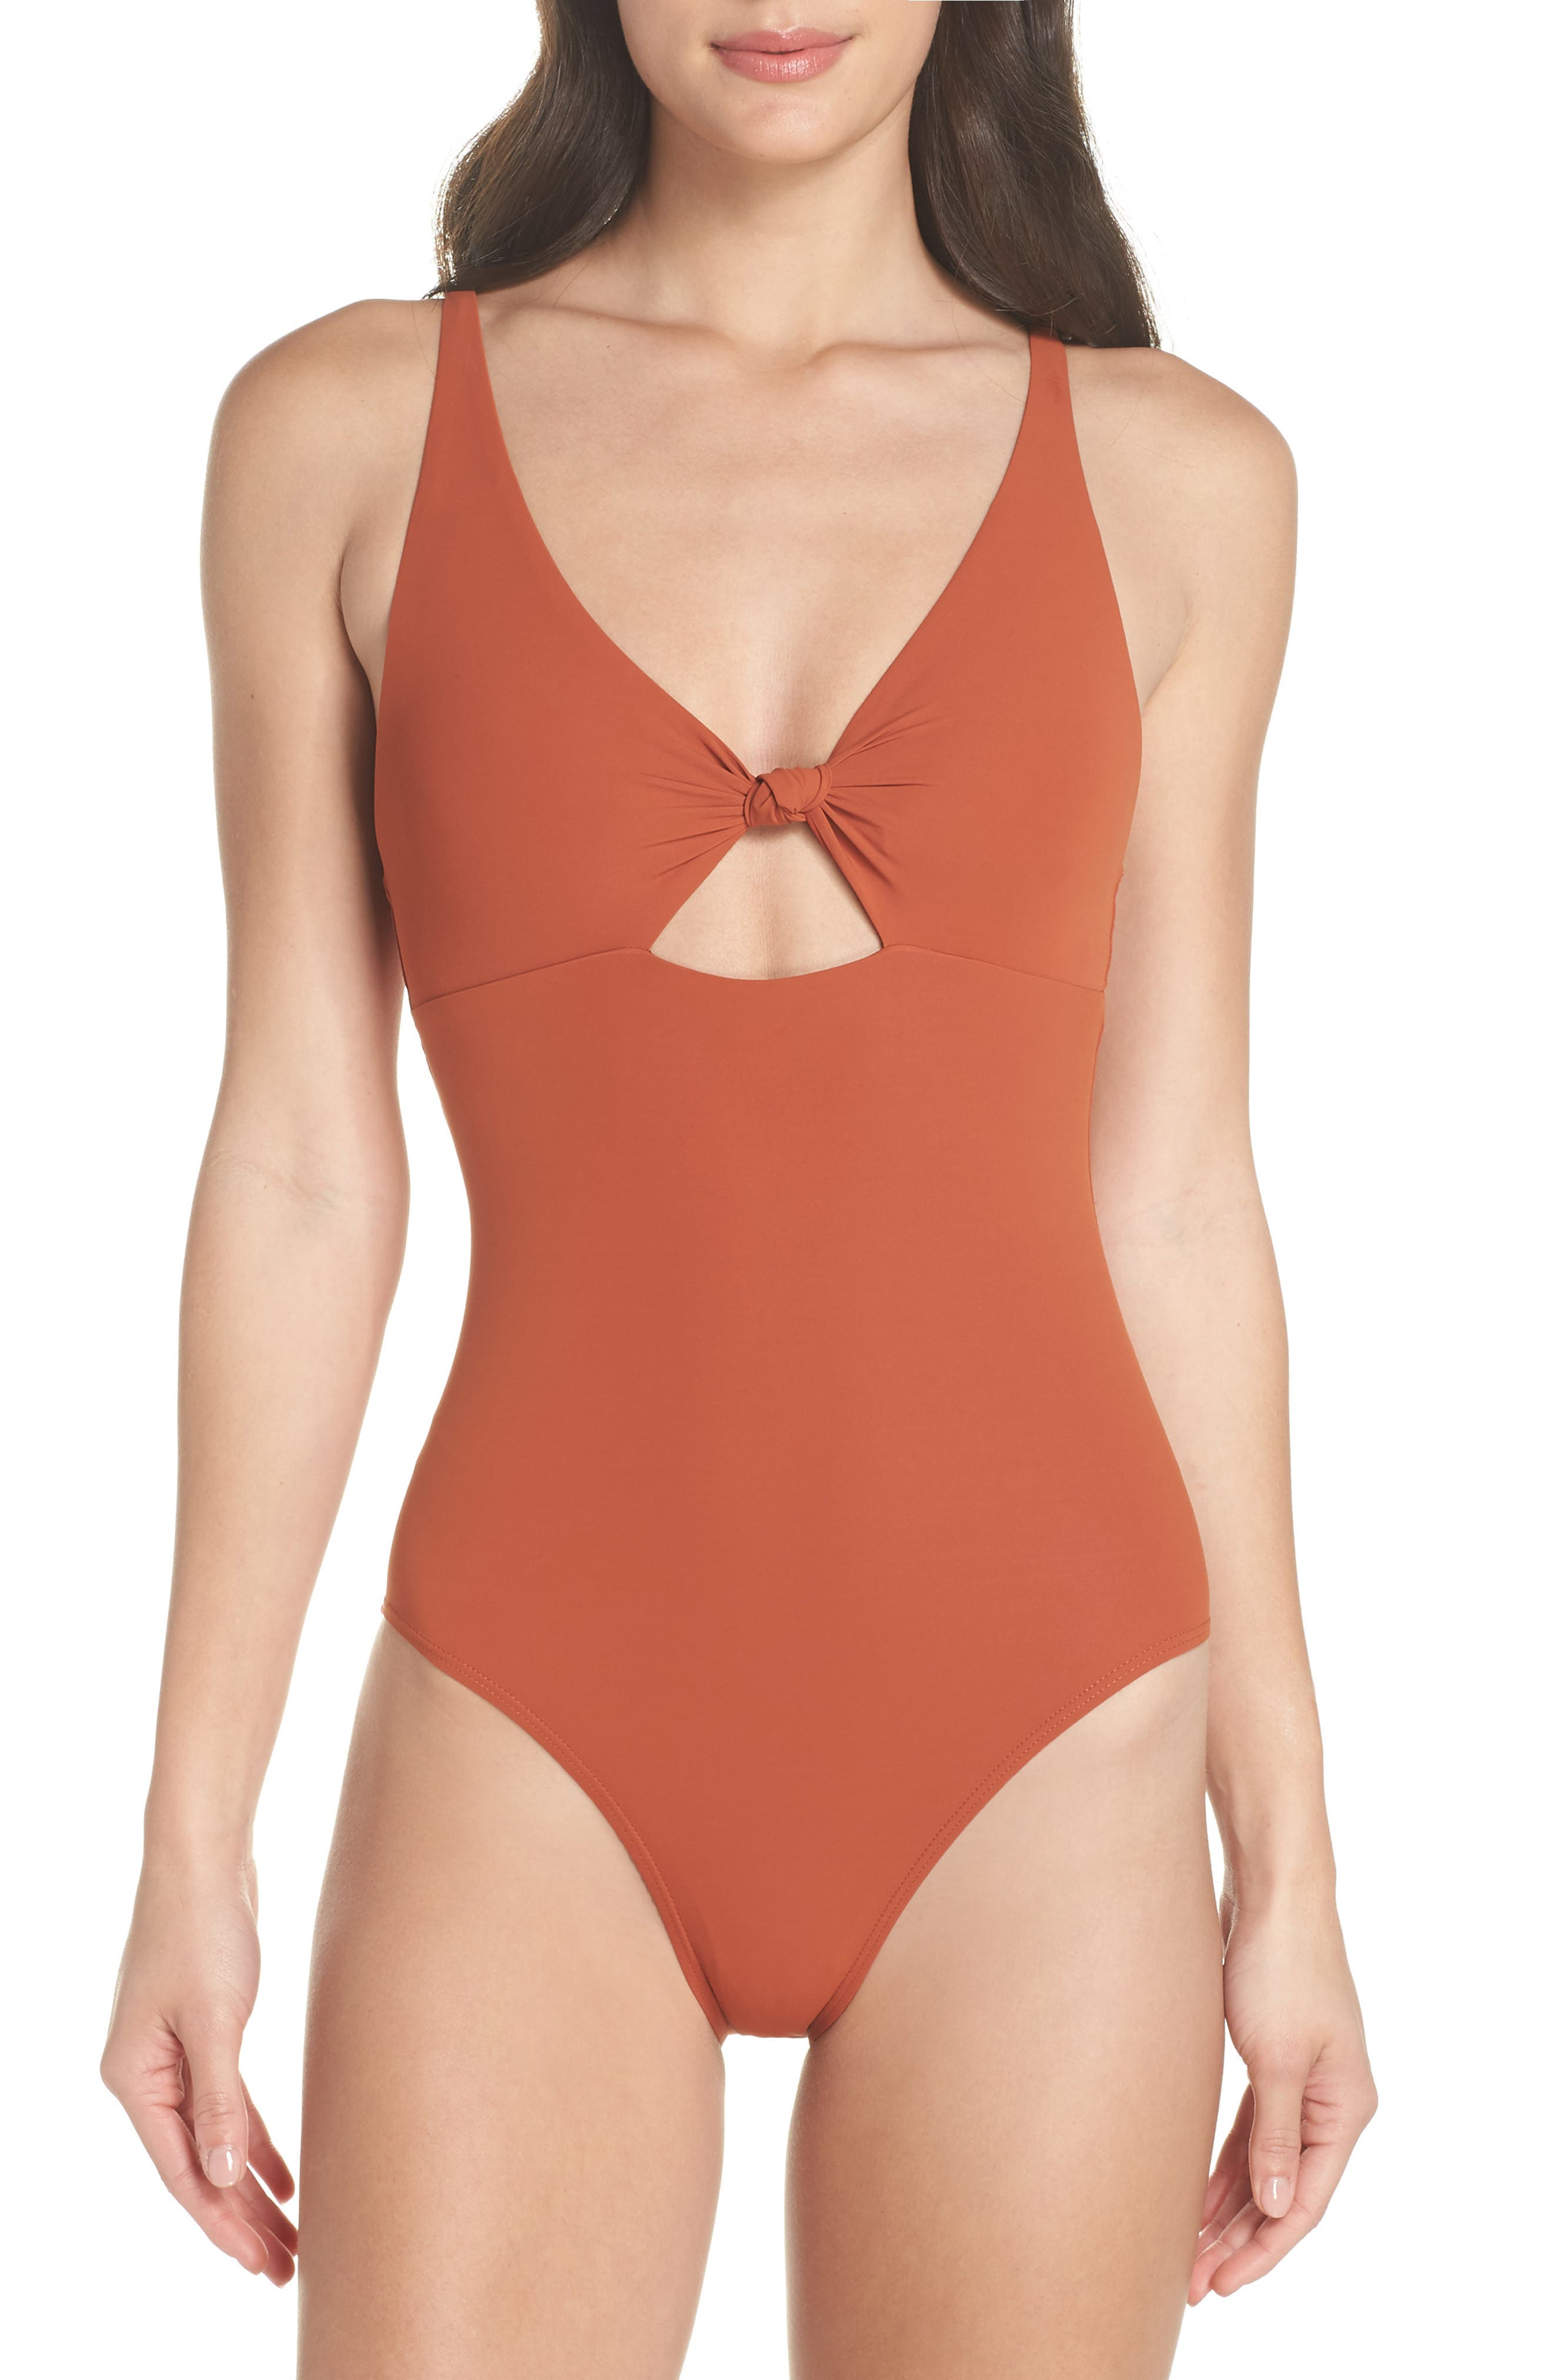 Palma One-Piece Swimsuit,                             Main thumbnail 1, color,                             DESERT SPICE